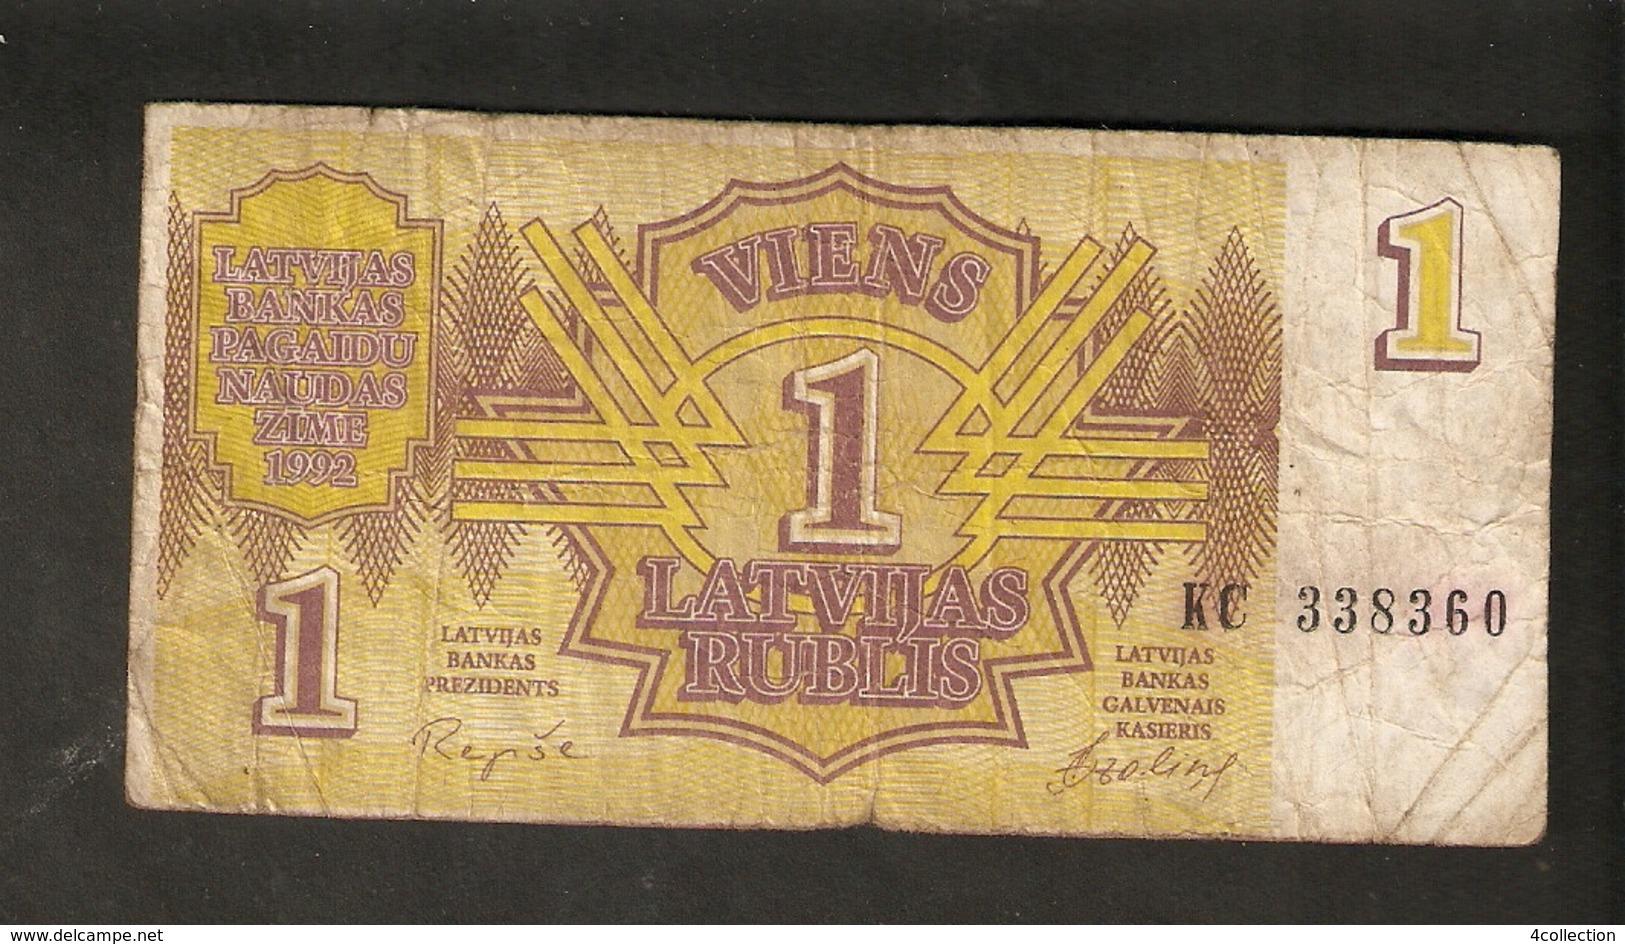 Pa. Latvia Lettland 1 Latvijas Rublis Latvian Ruble Rouble 1992 Ser. KC 338360 Banknote Repshe - Lettonie